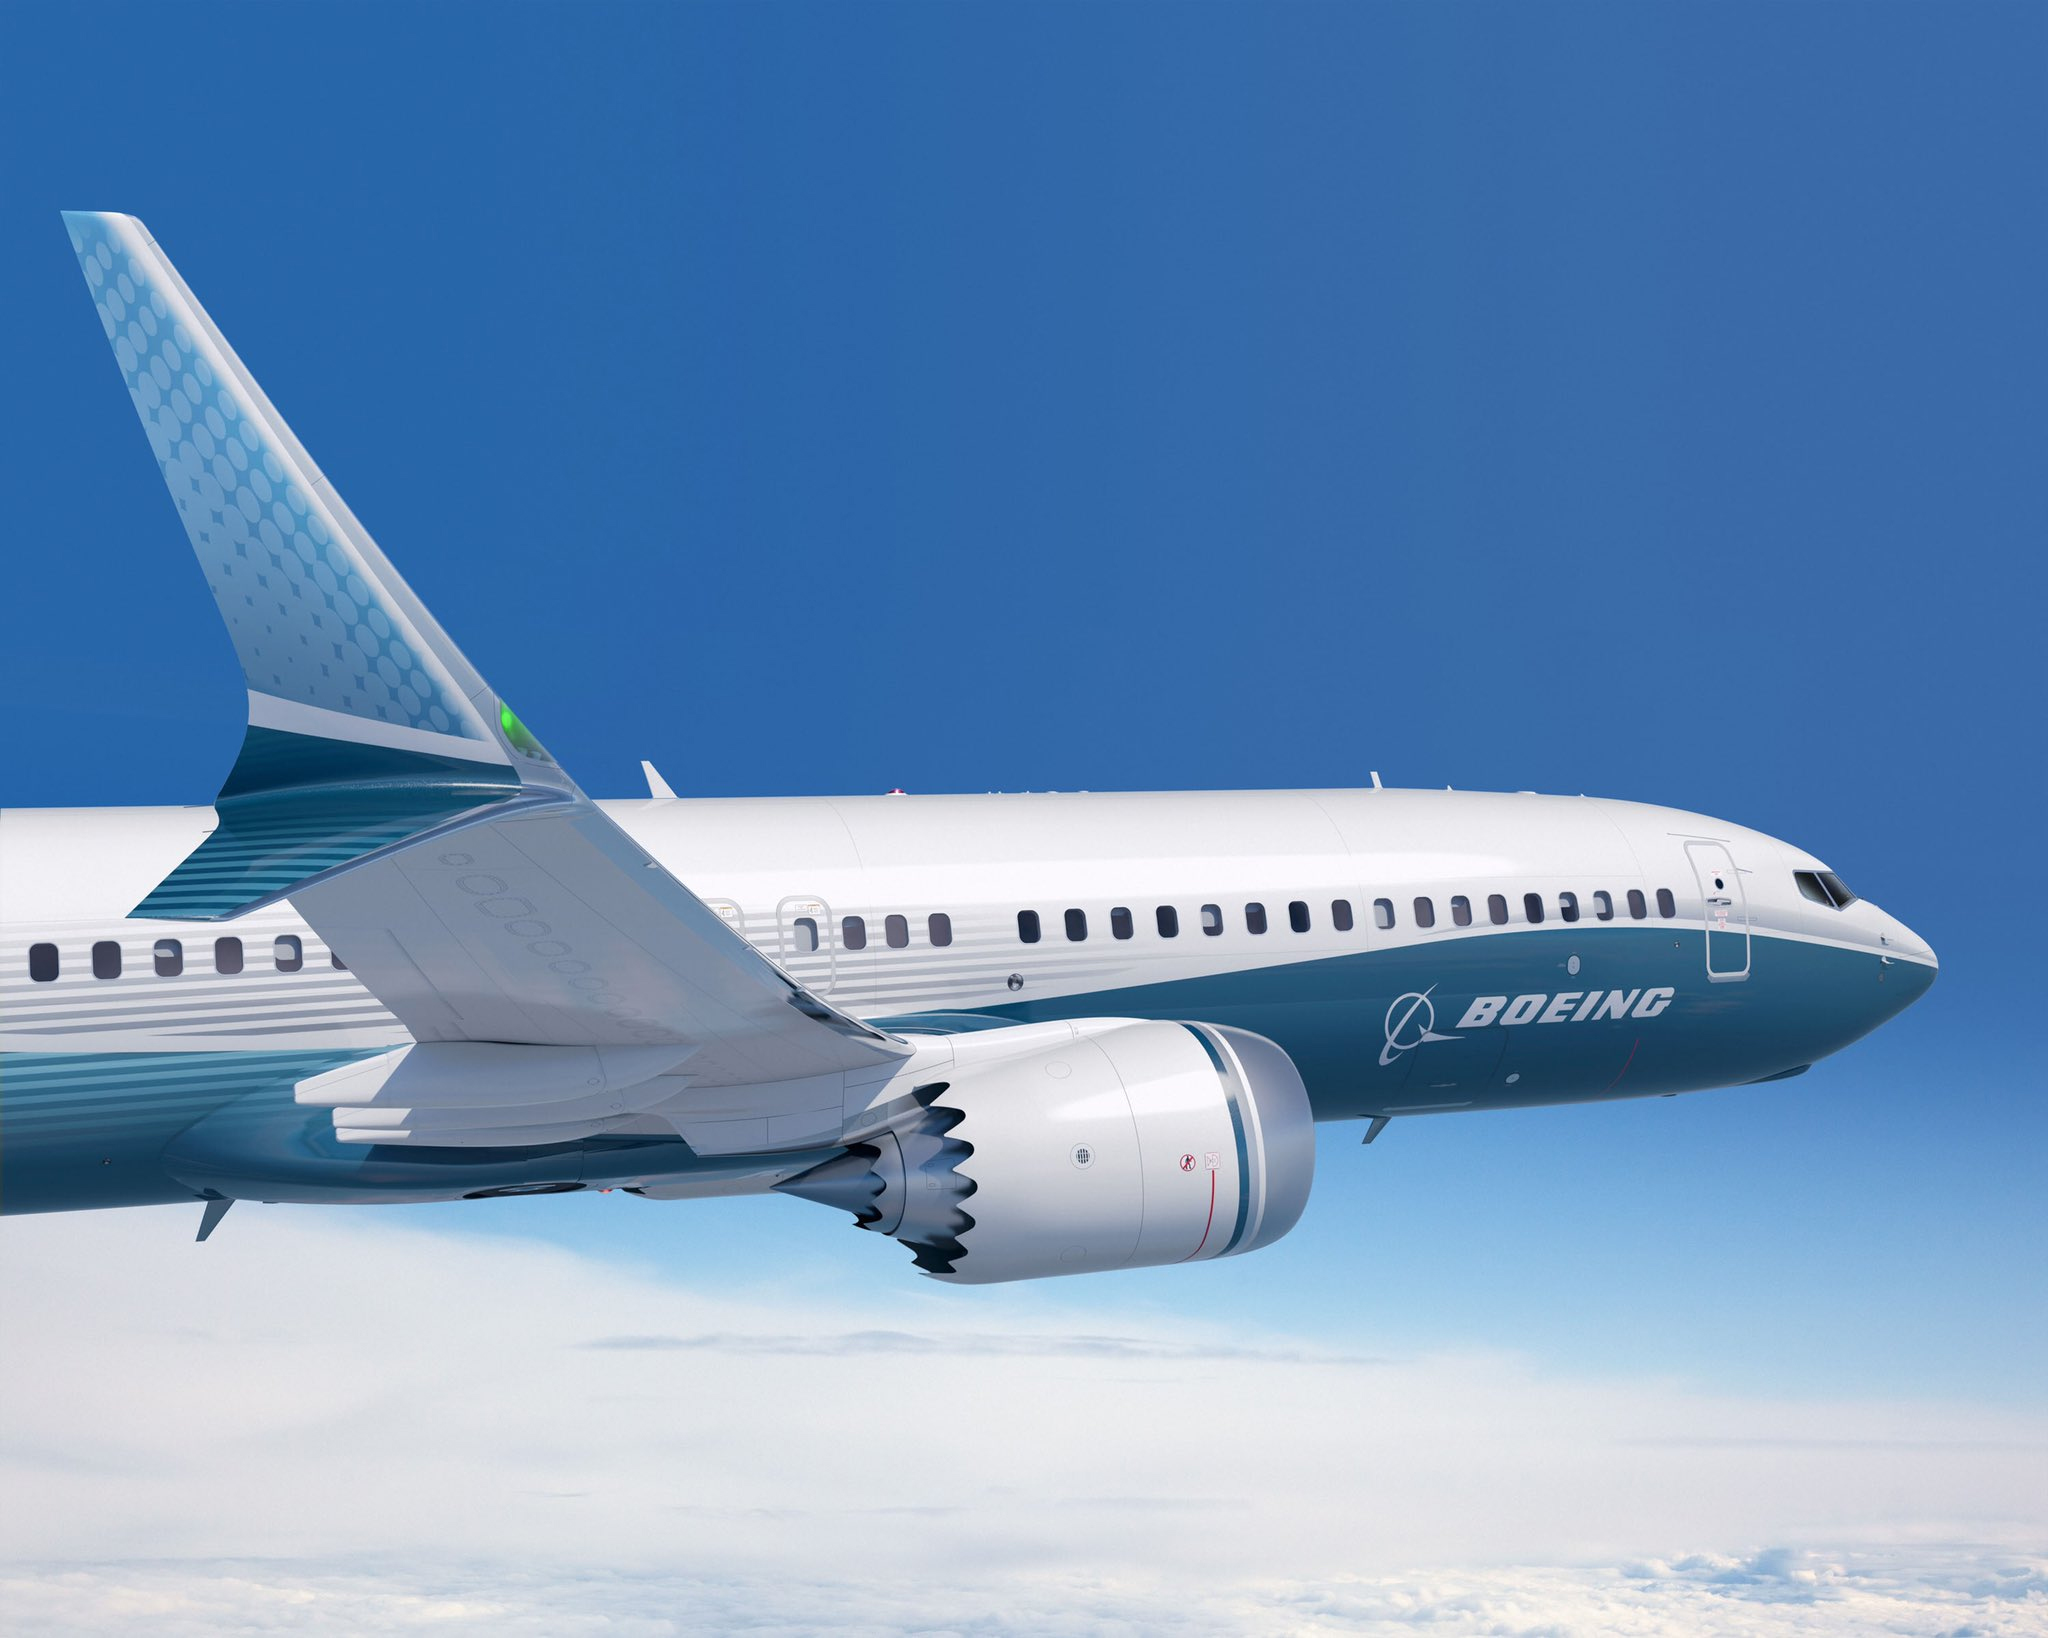 737 MAX 8 (Boeing)